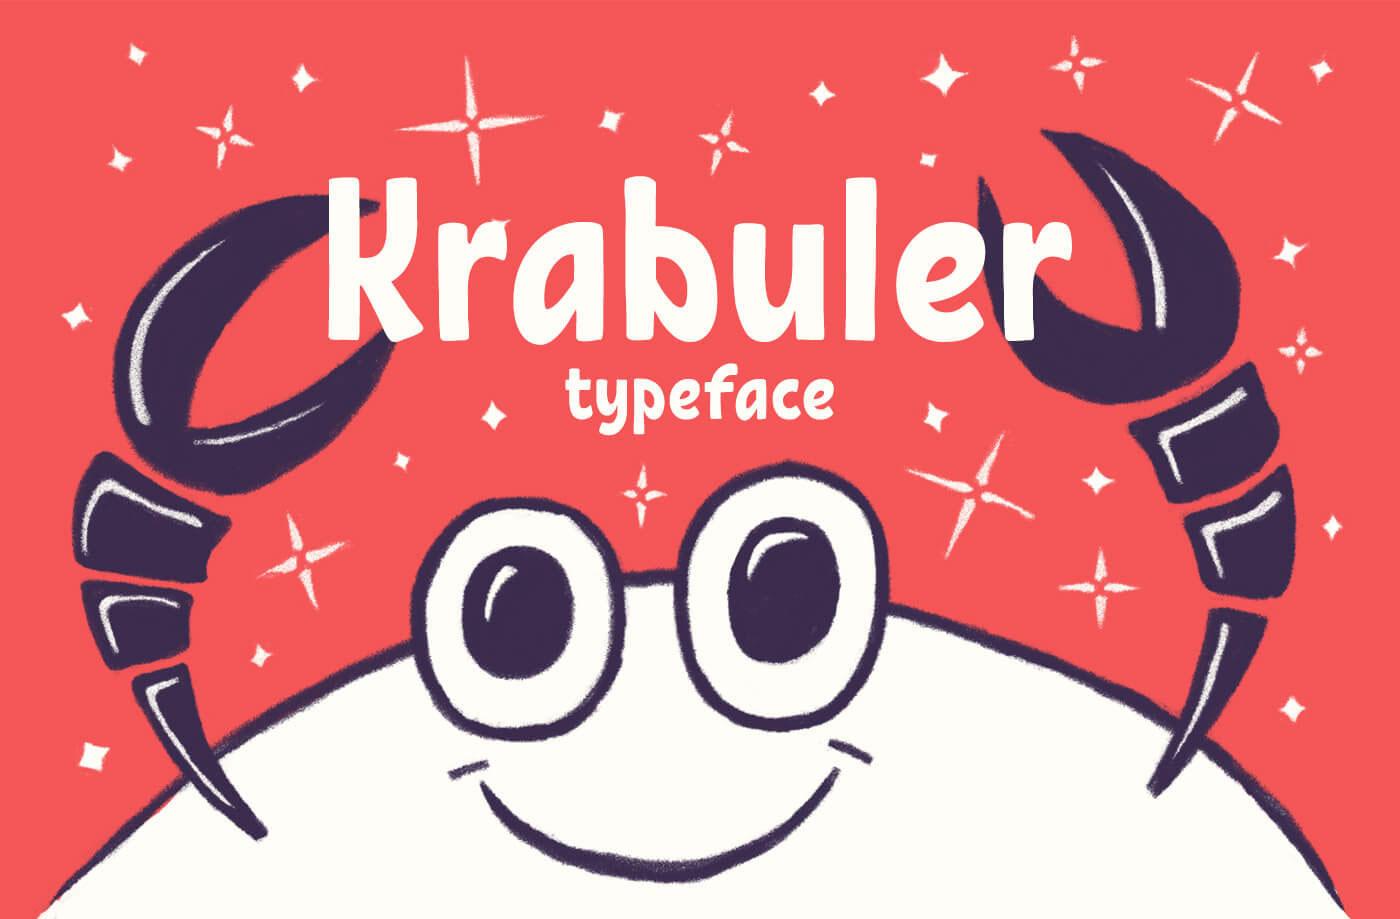 Typeface clipart cartoon Typeface Krabuler Behance Free Krabuler